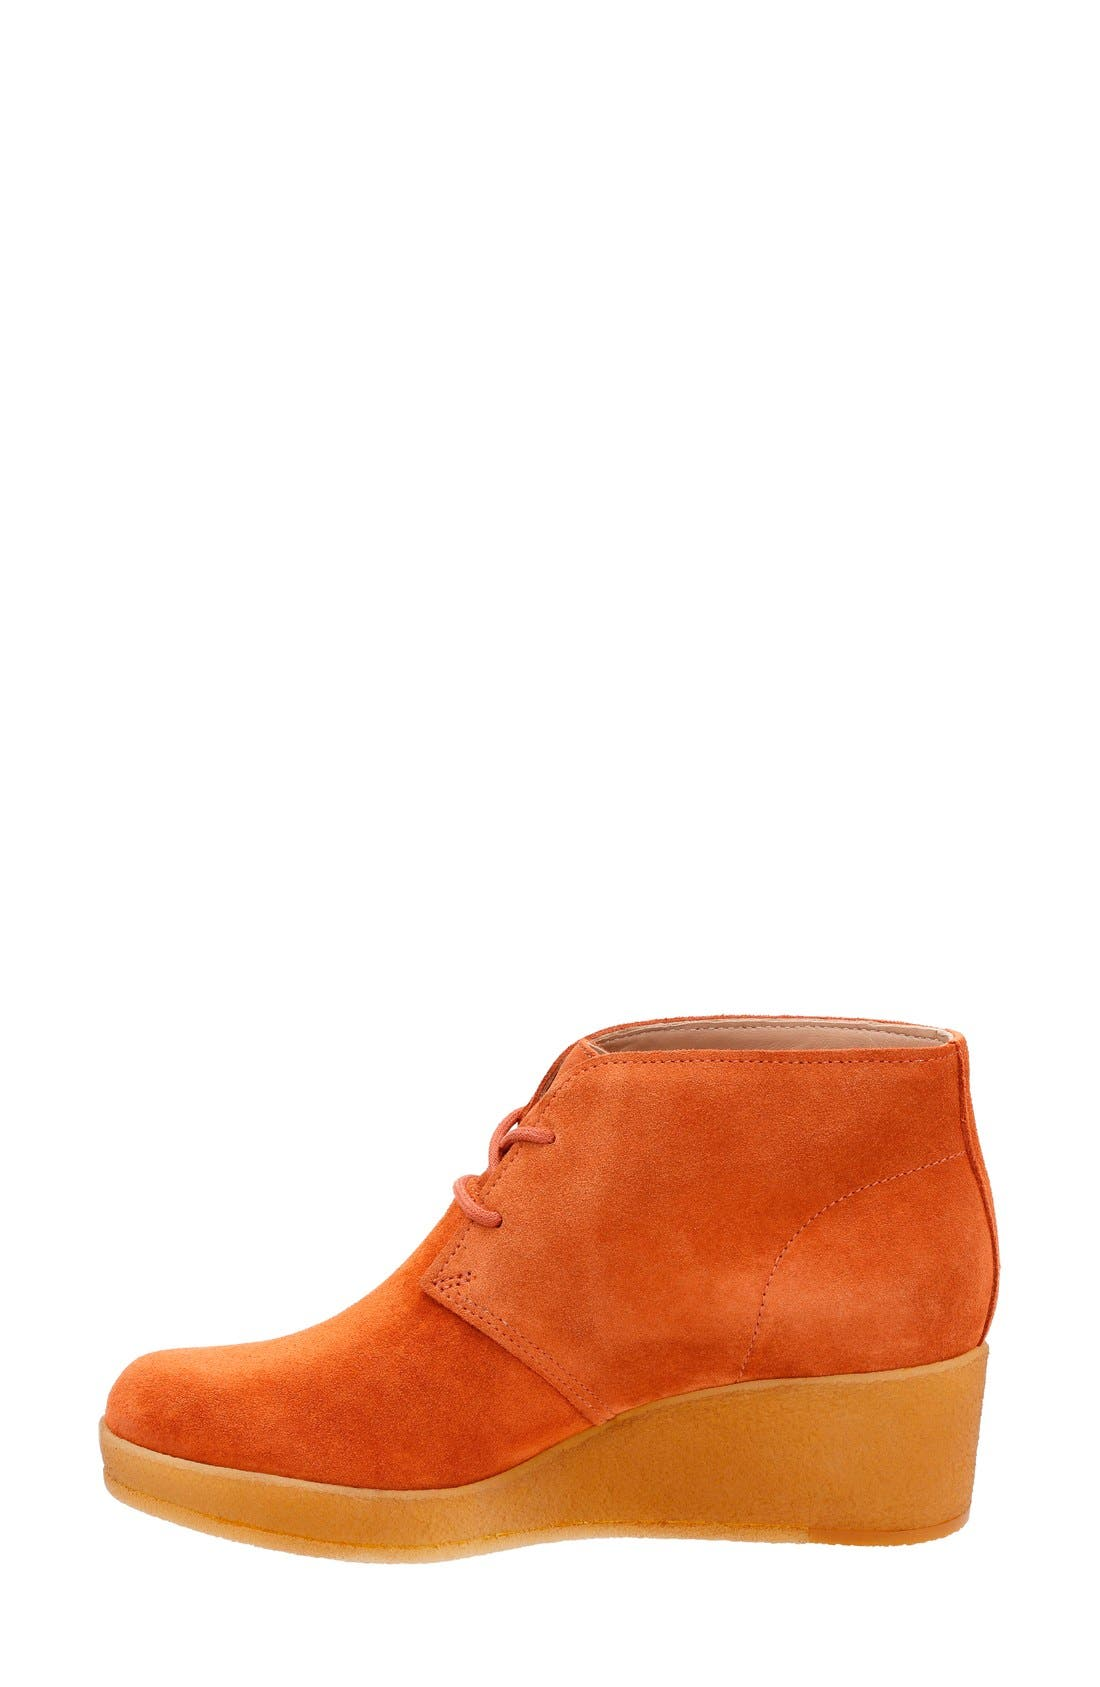 Alternate Image 2  - Clarks® Originals 'Athie Terra' Wedge Boot (Women)